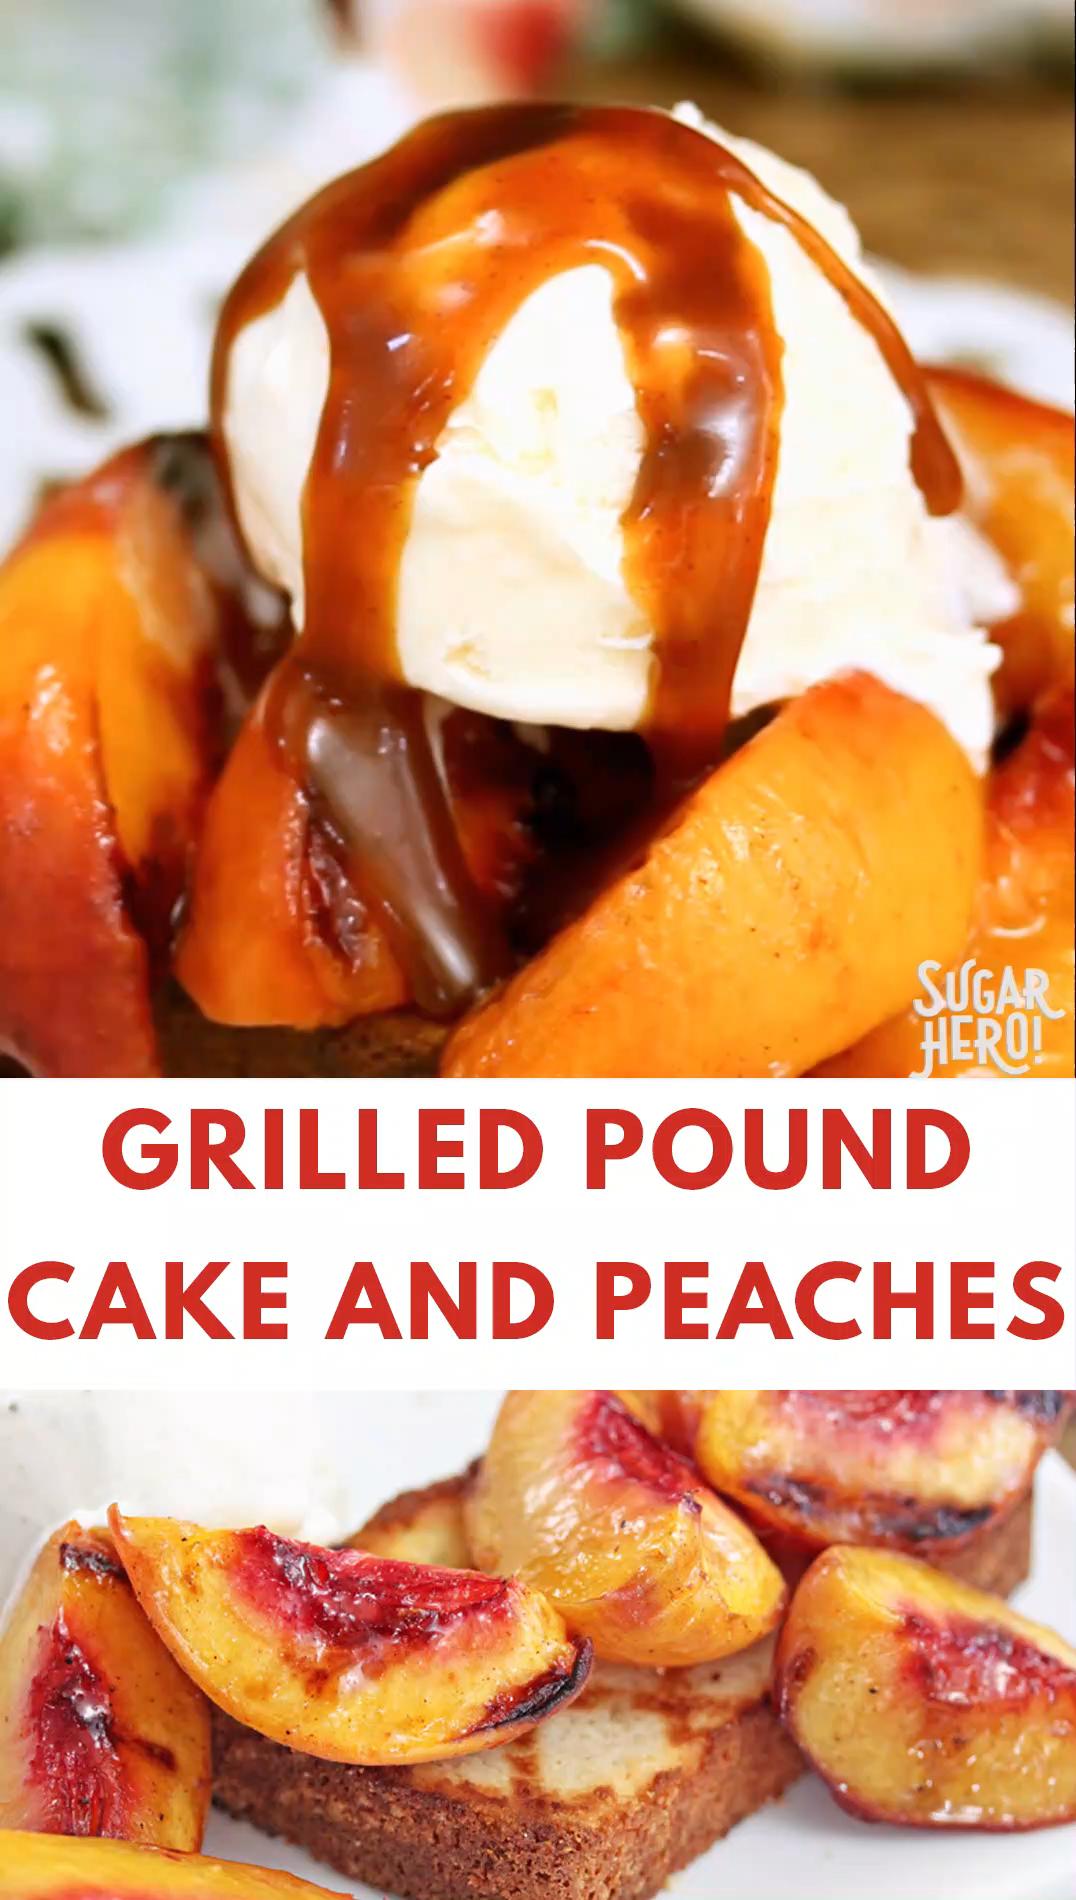 Grilled Pound Cake and Peaches Video  #peachcobblerpoundcake